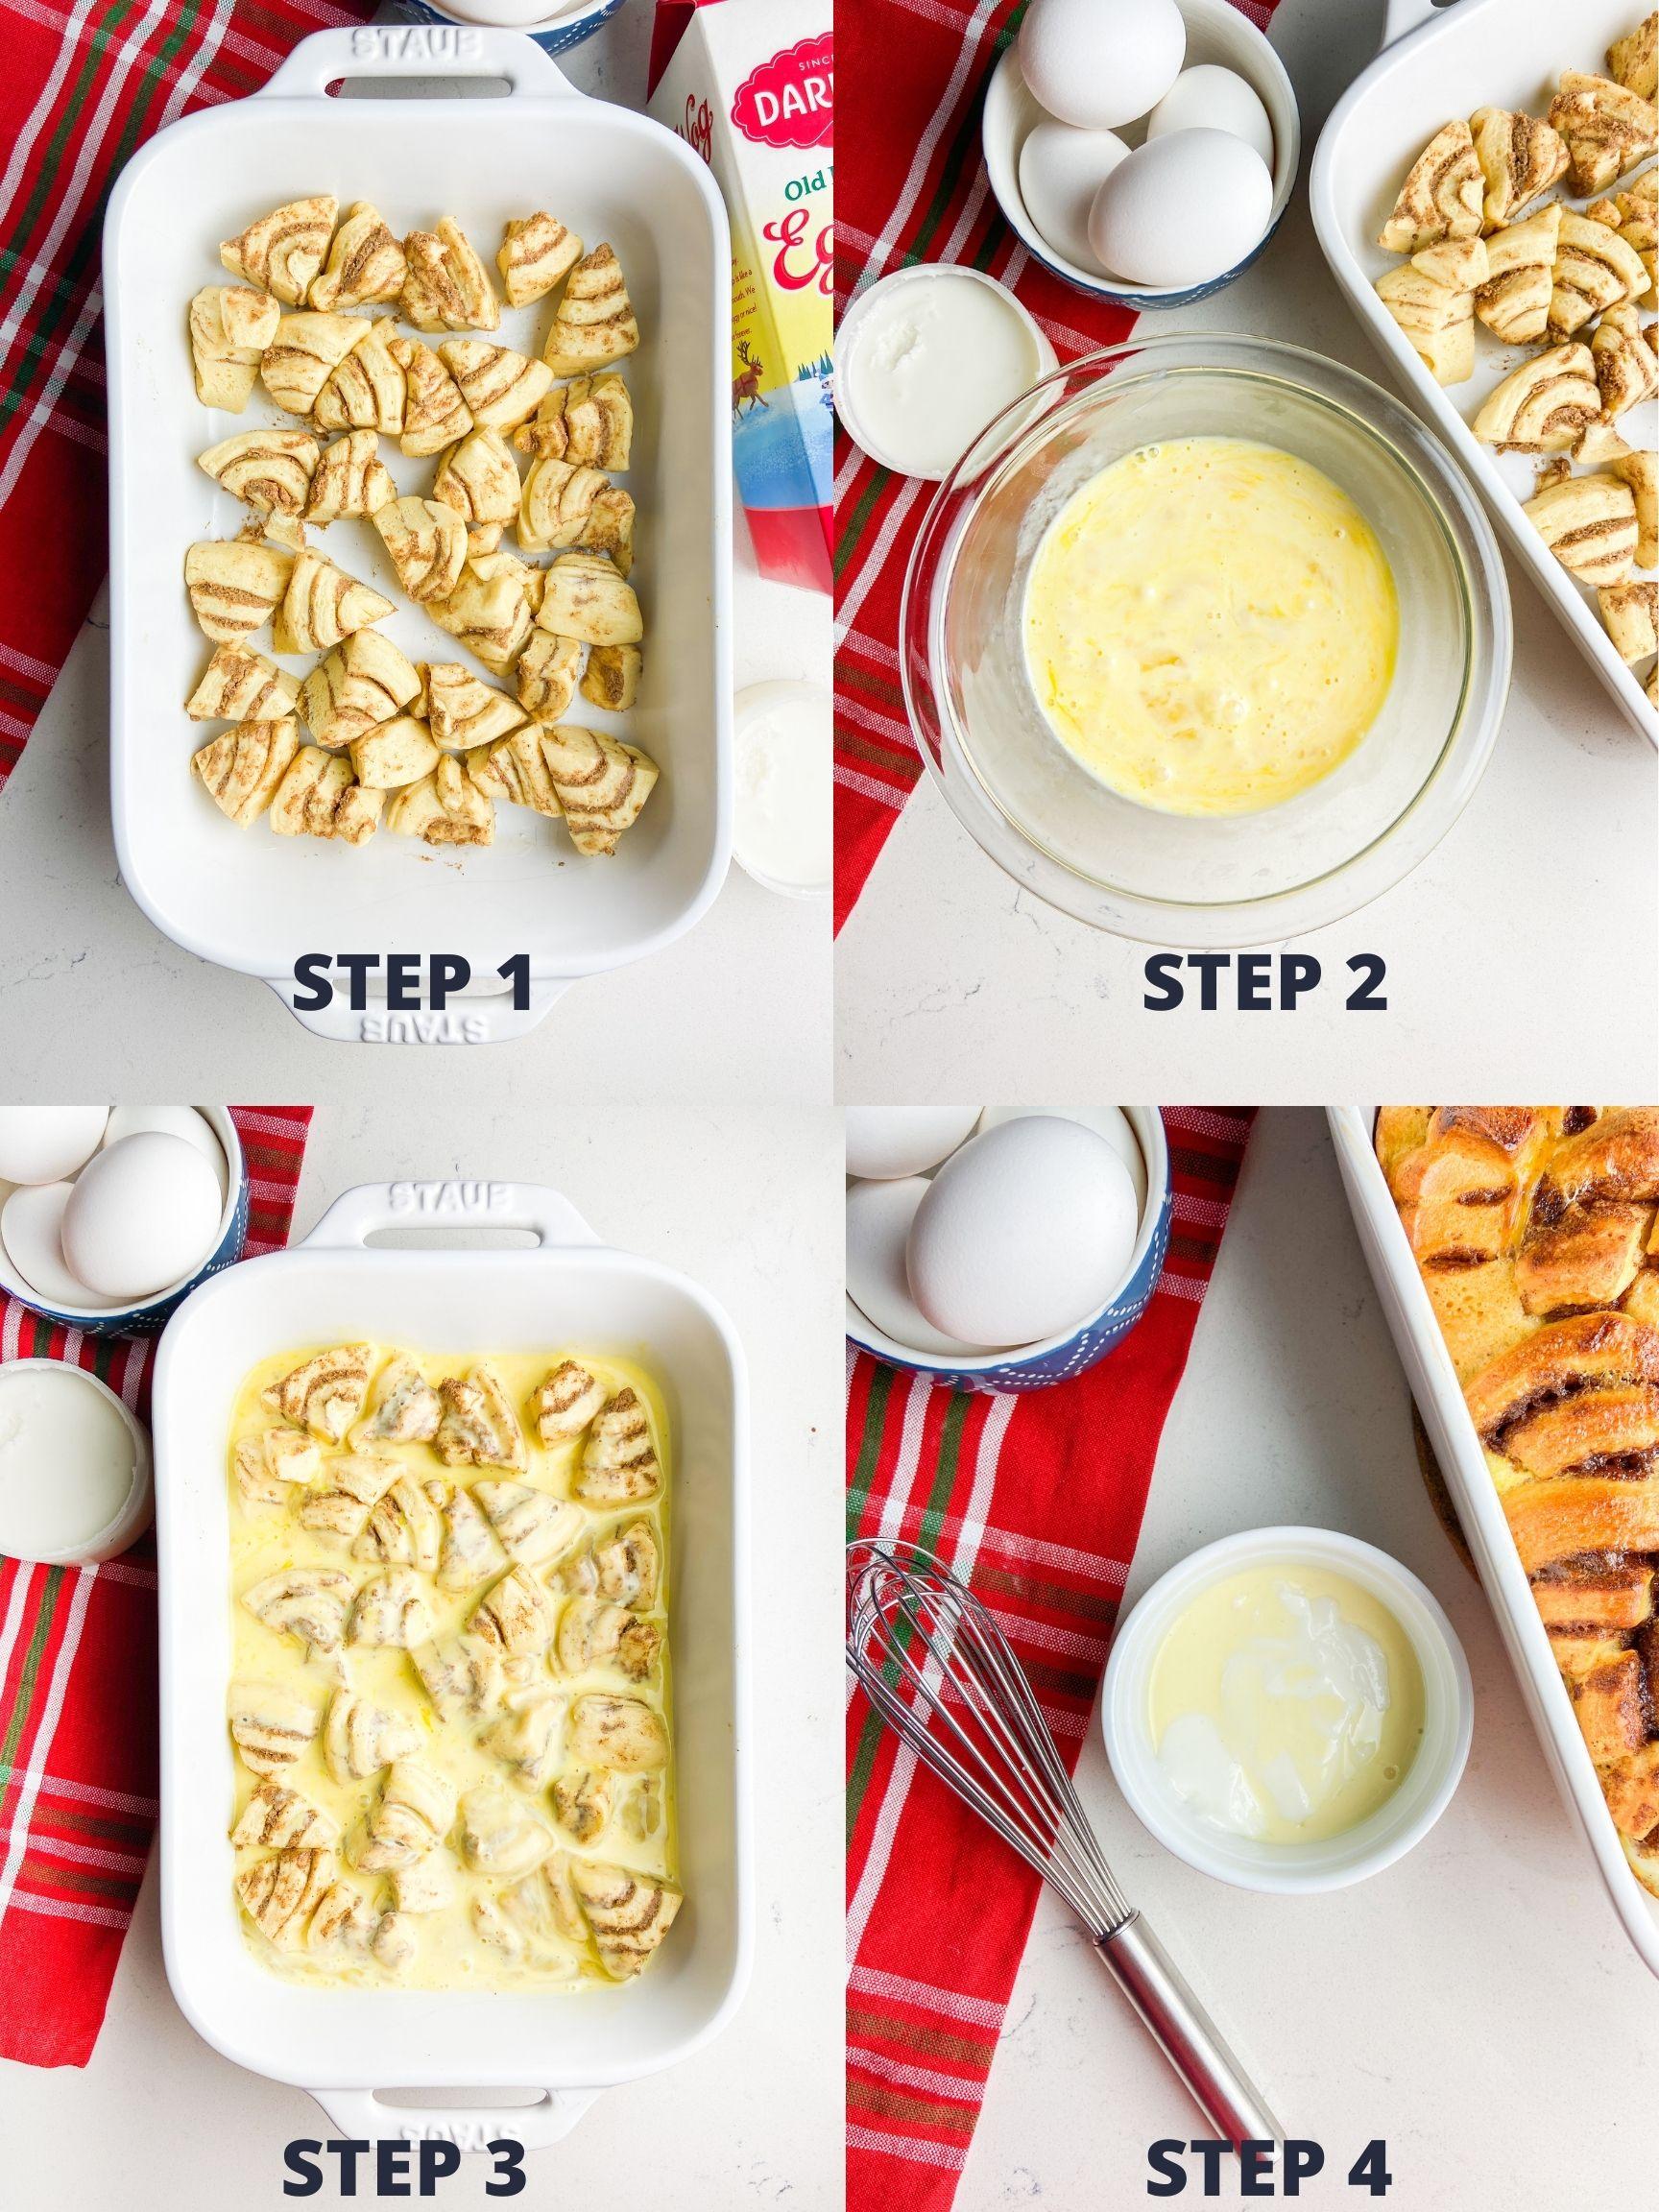 Step by step photos